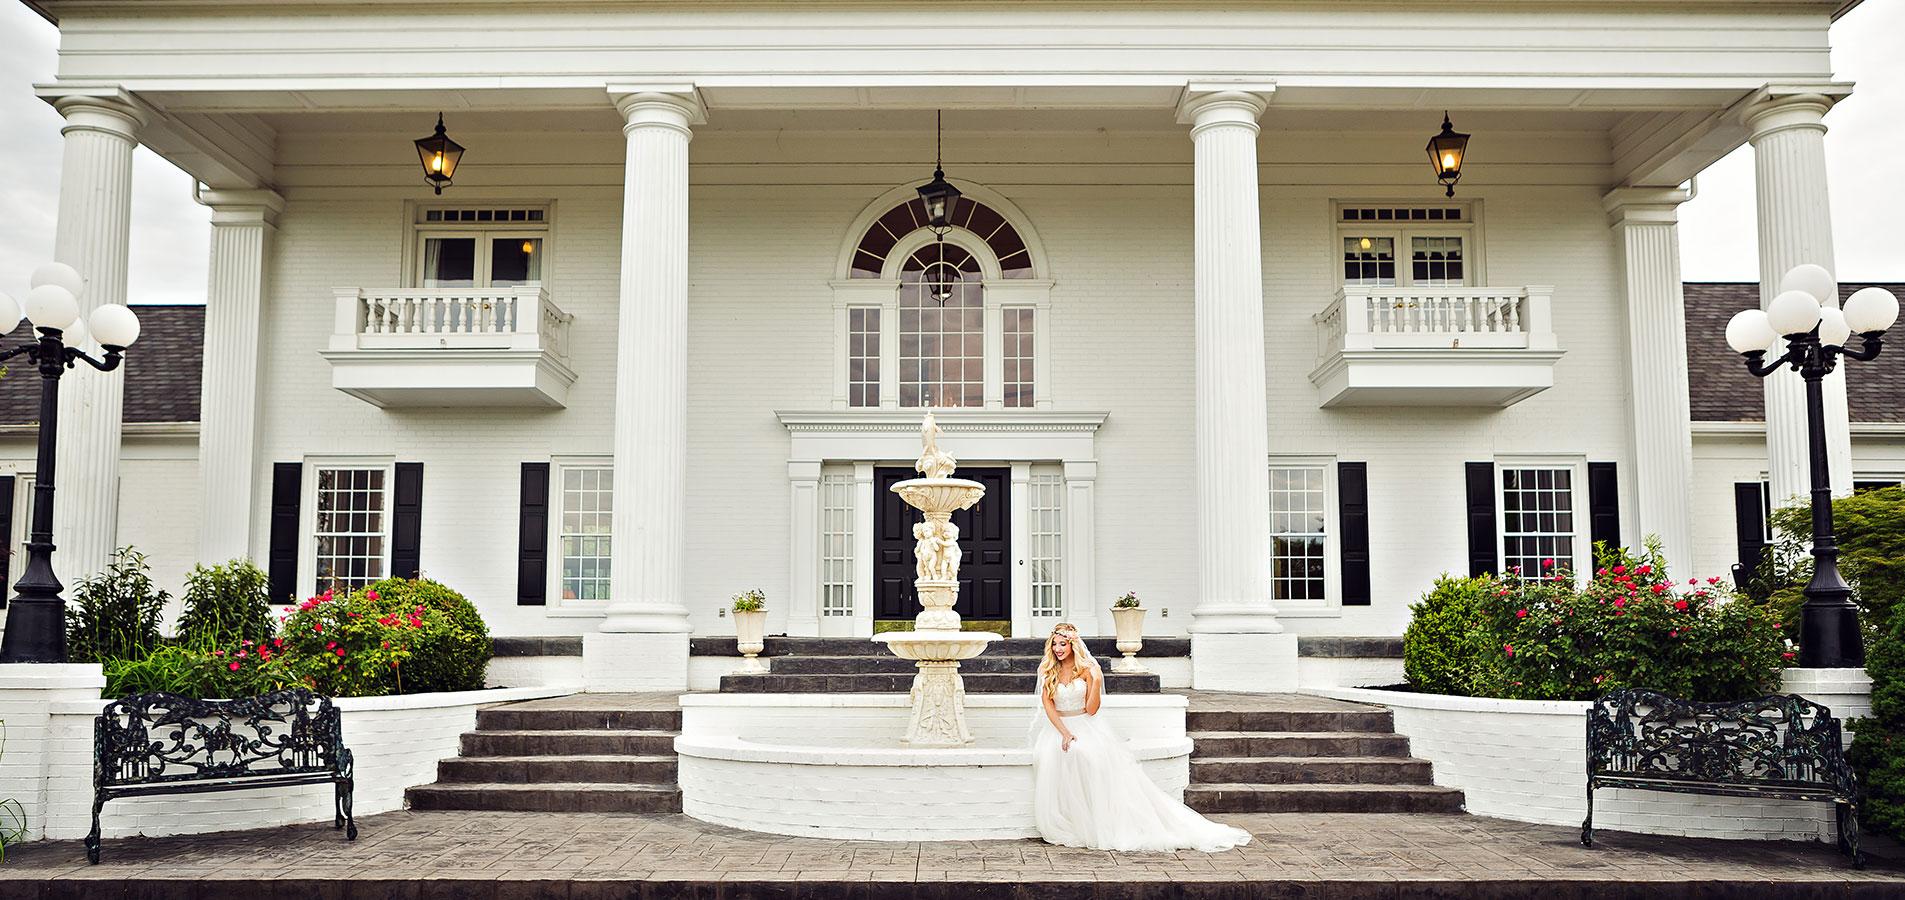 Slider_Weddings-Image-01.jpg